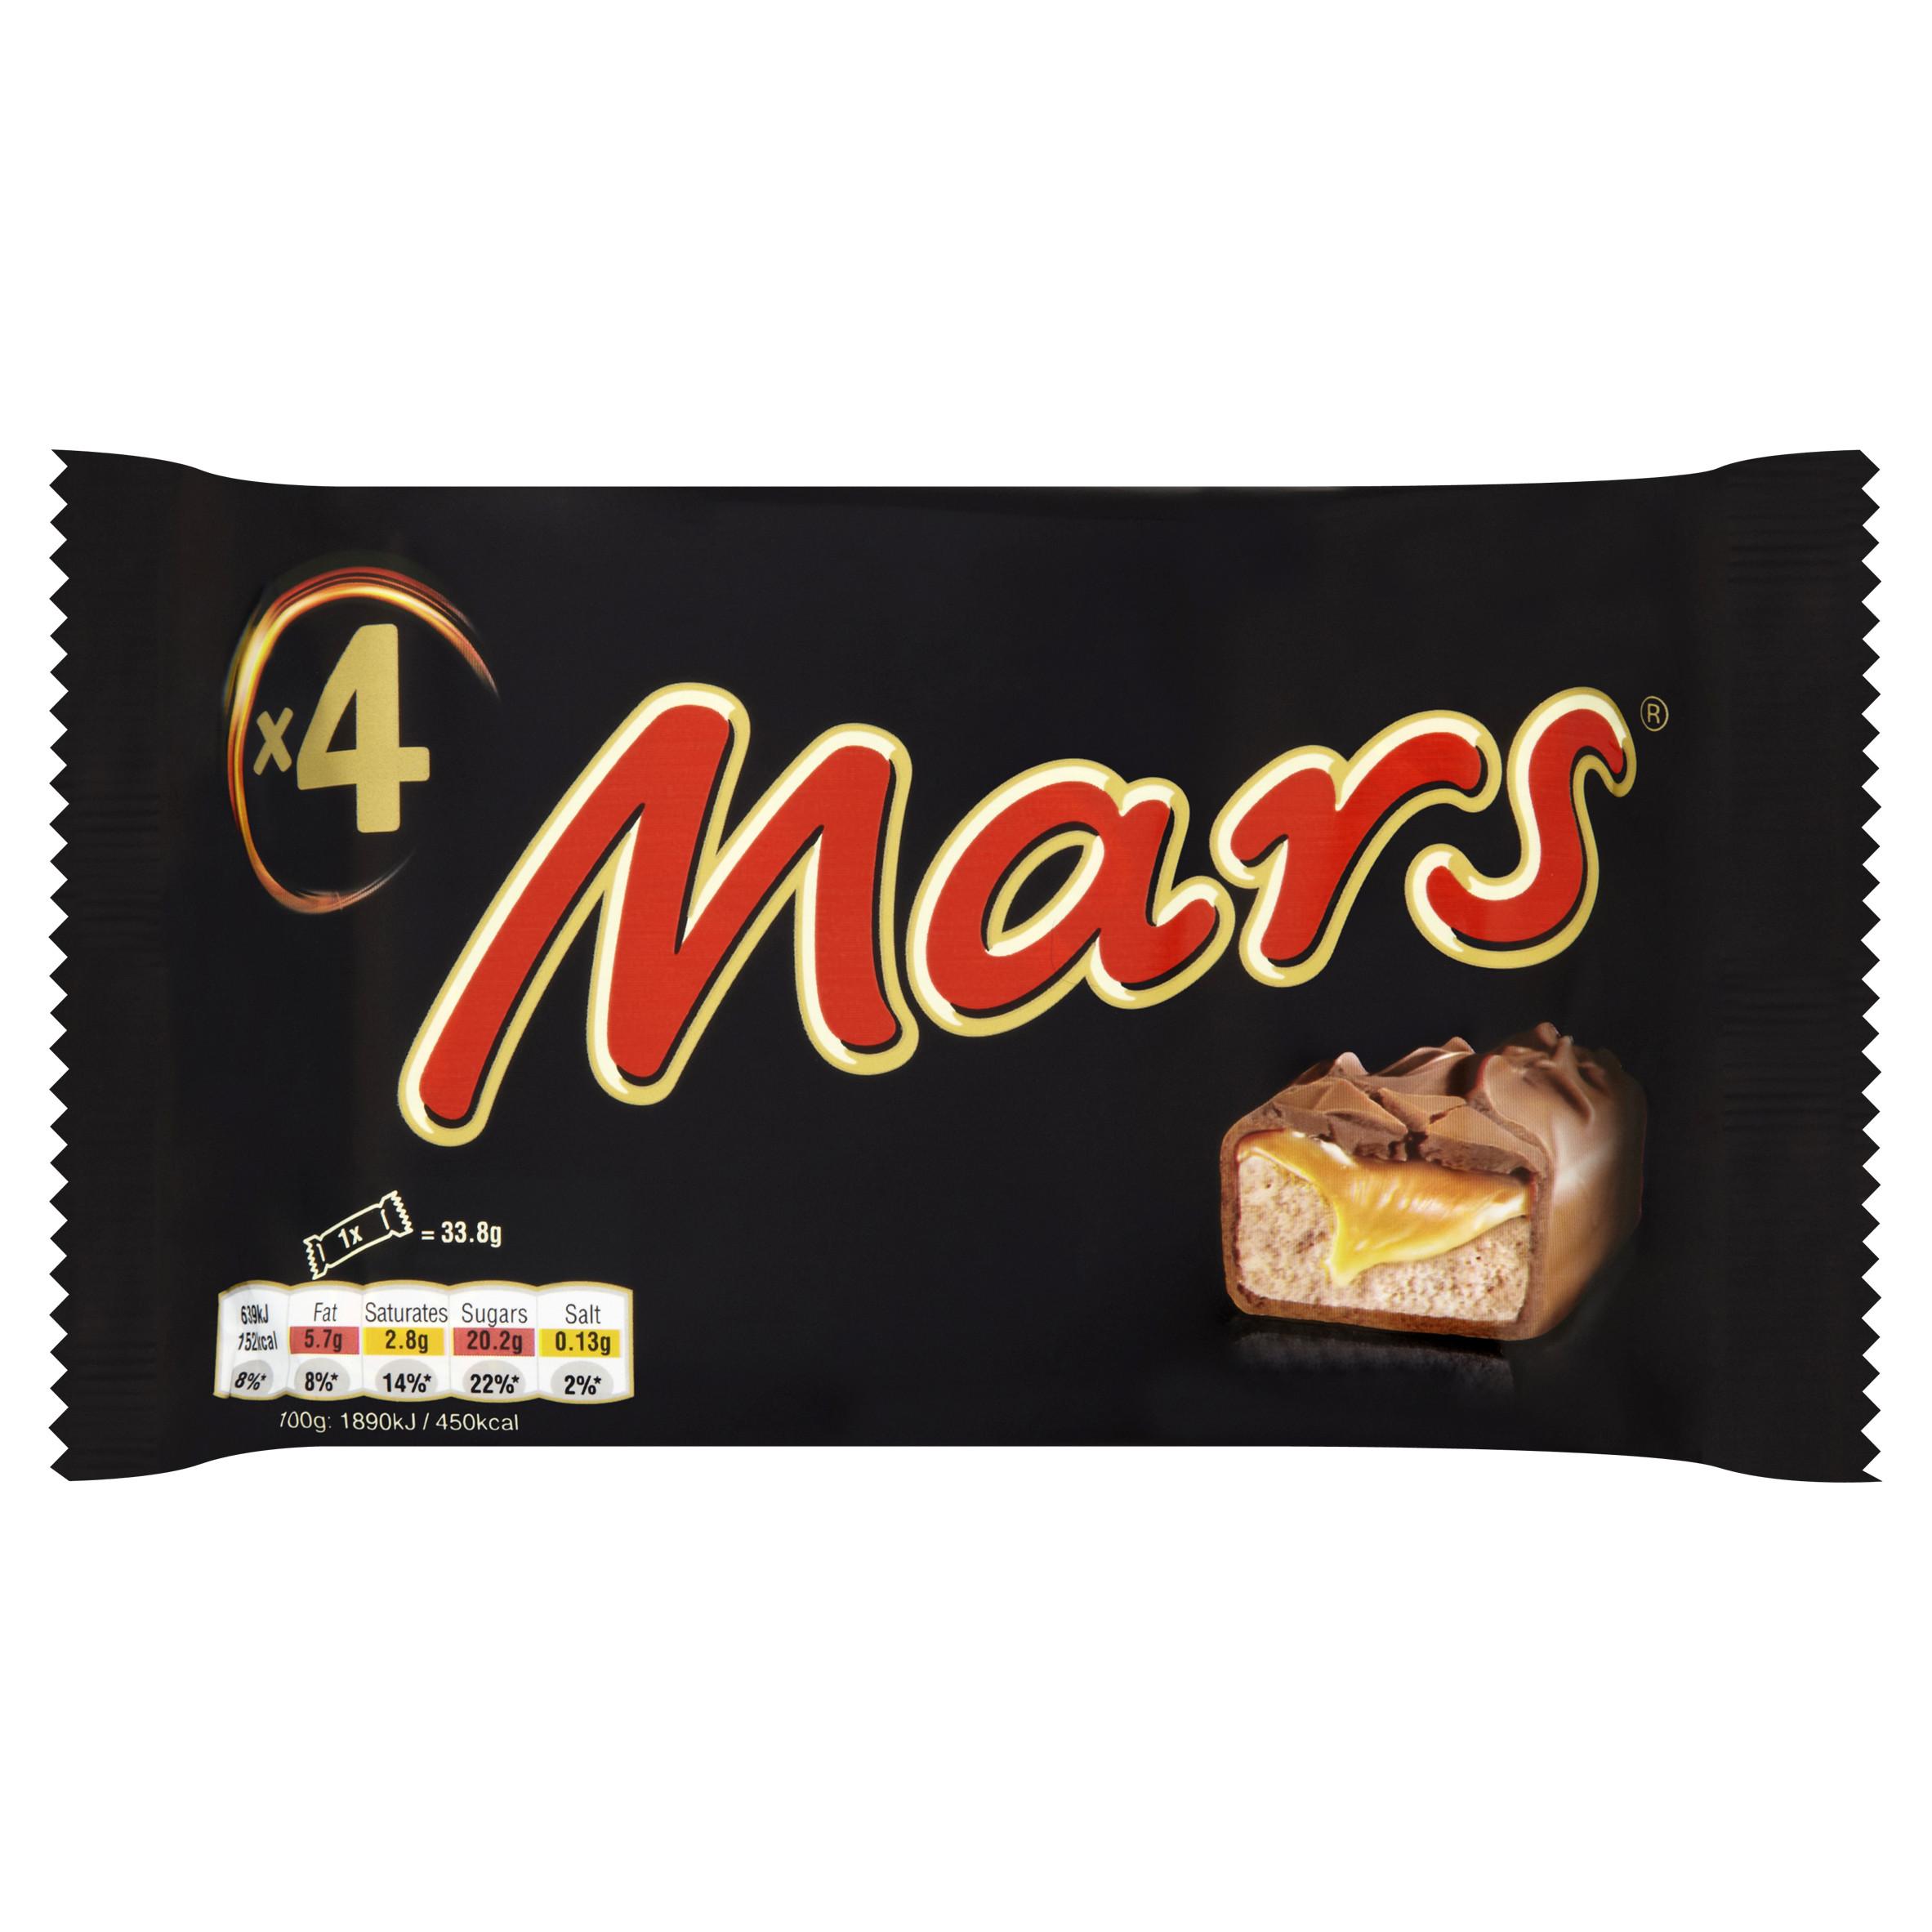 Drawn chocolate mars bar #15